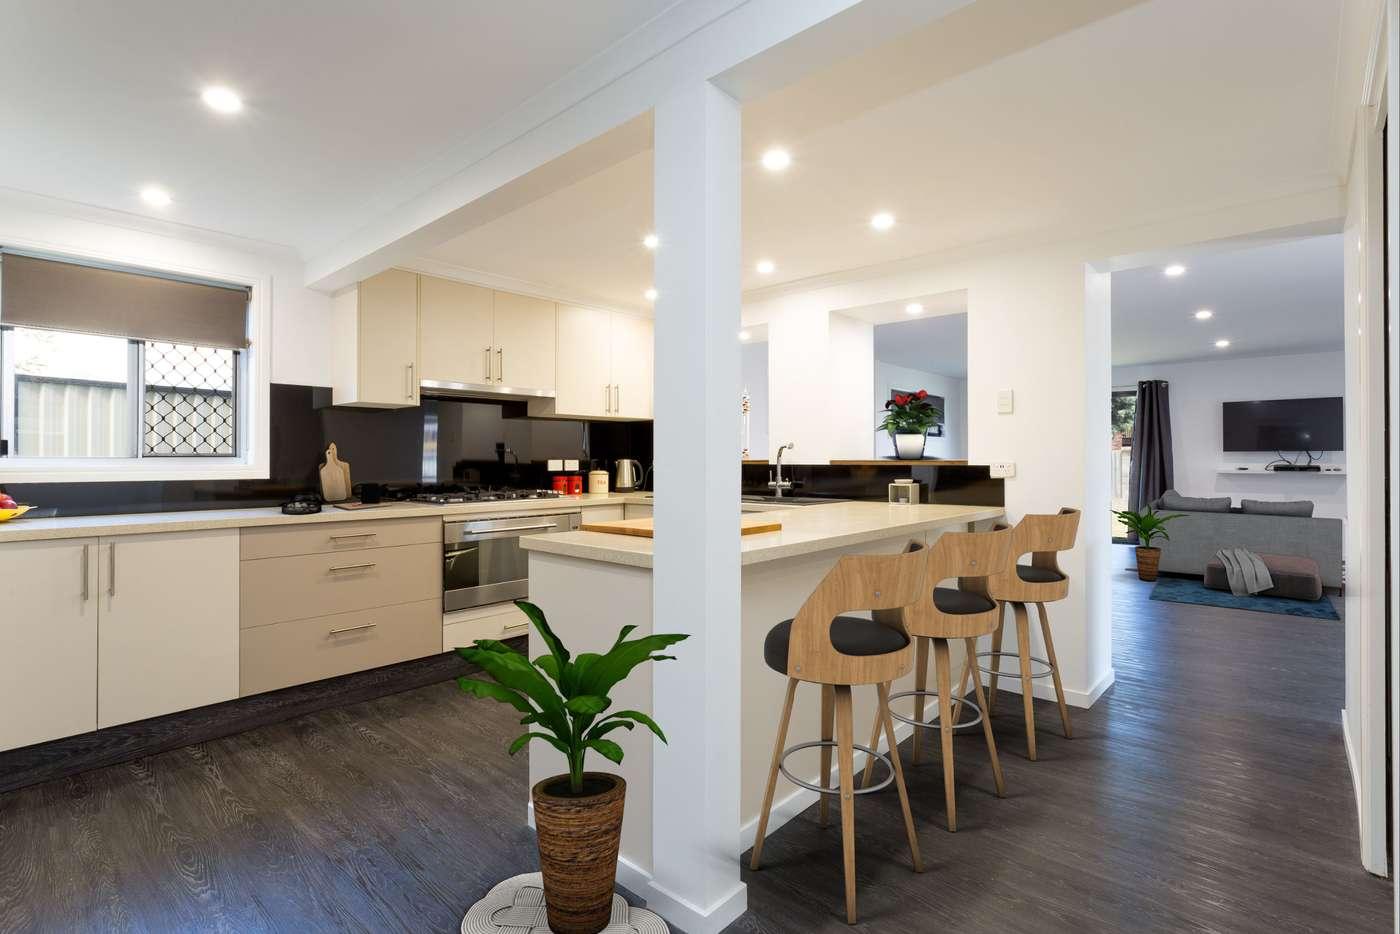 Main view of Homely house listing, 27 Stratford Street, Kippa-ring QLD 4021